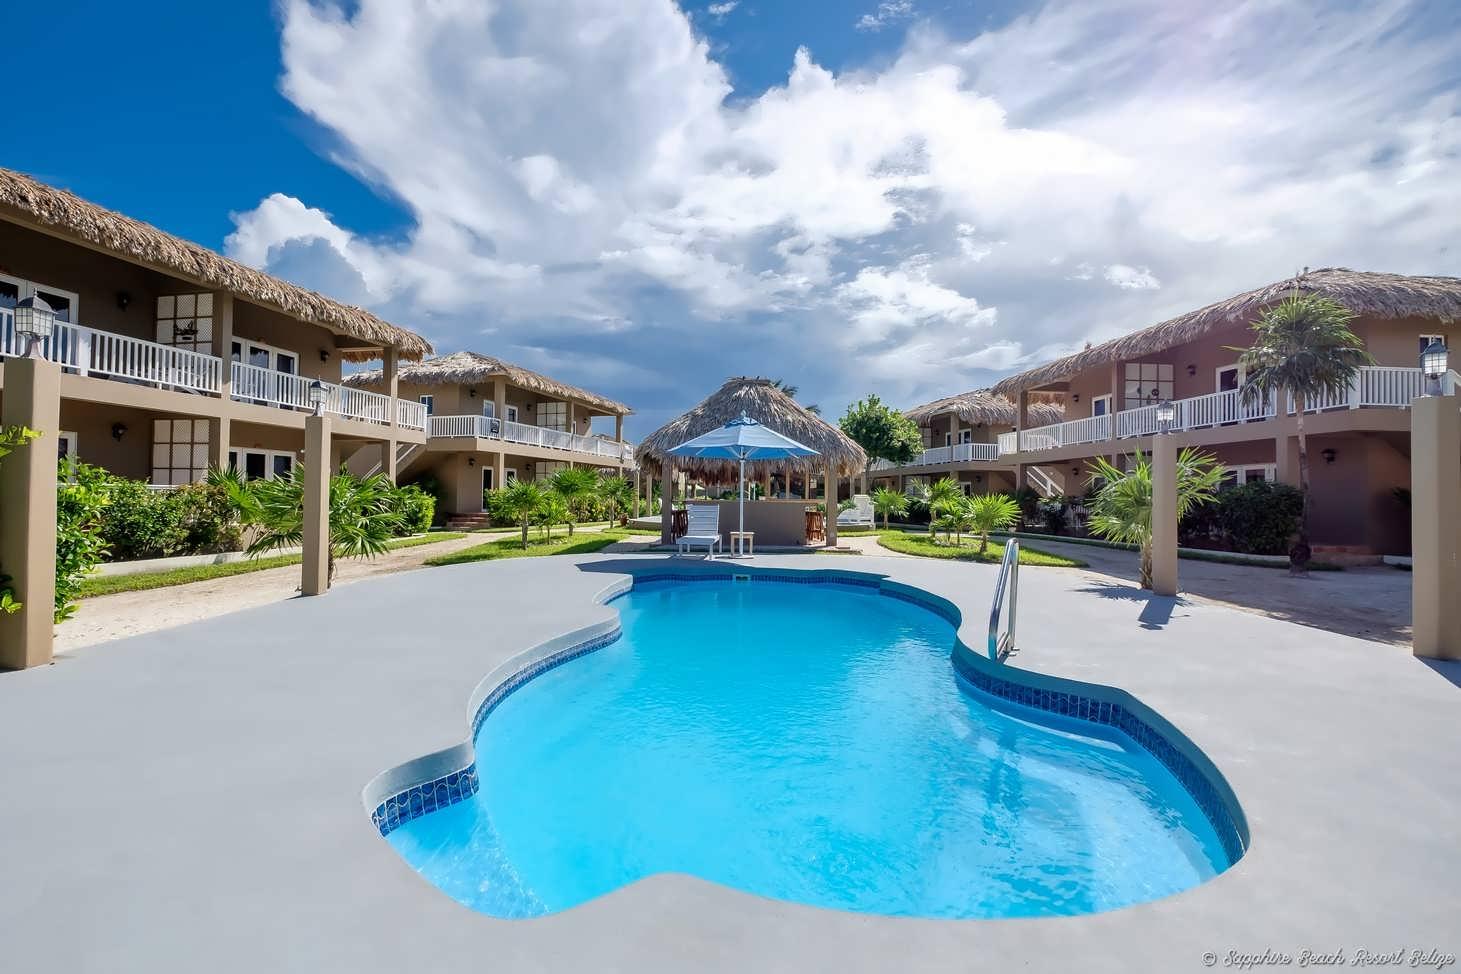 Sapphire Beach Resort Pools 25.jpg